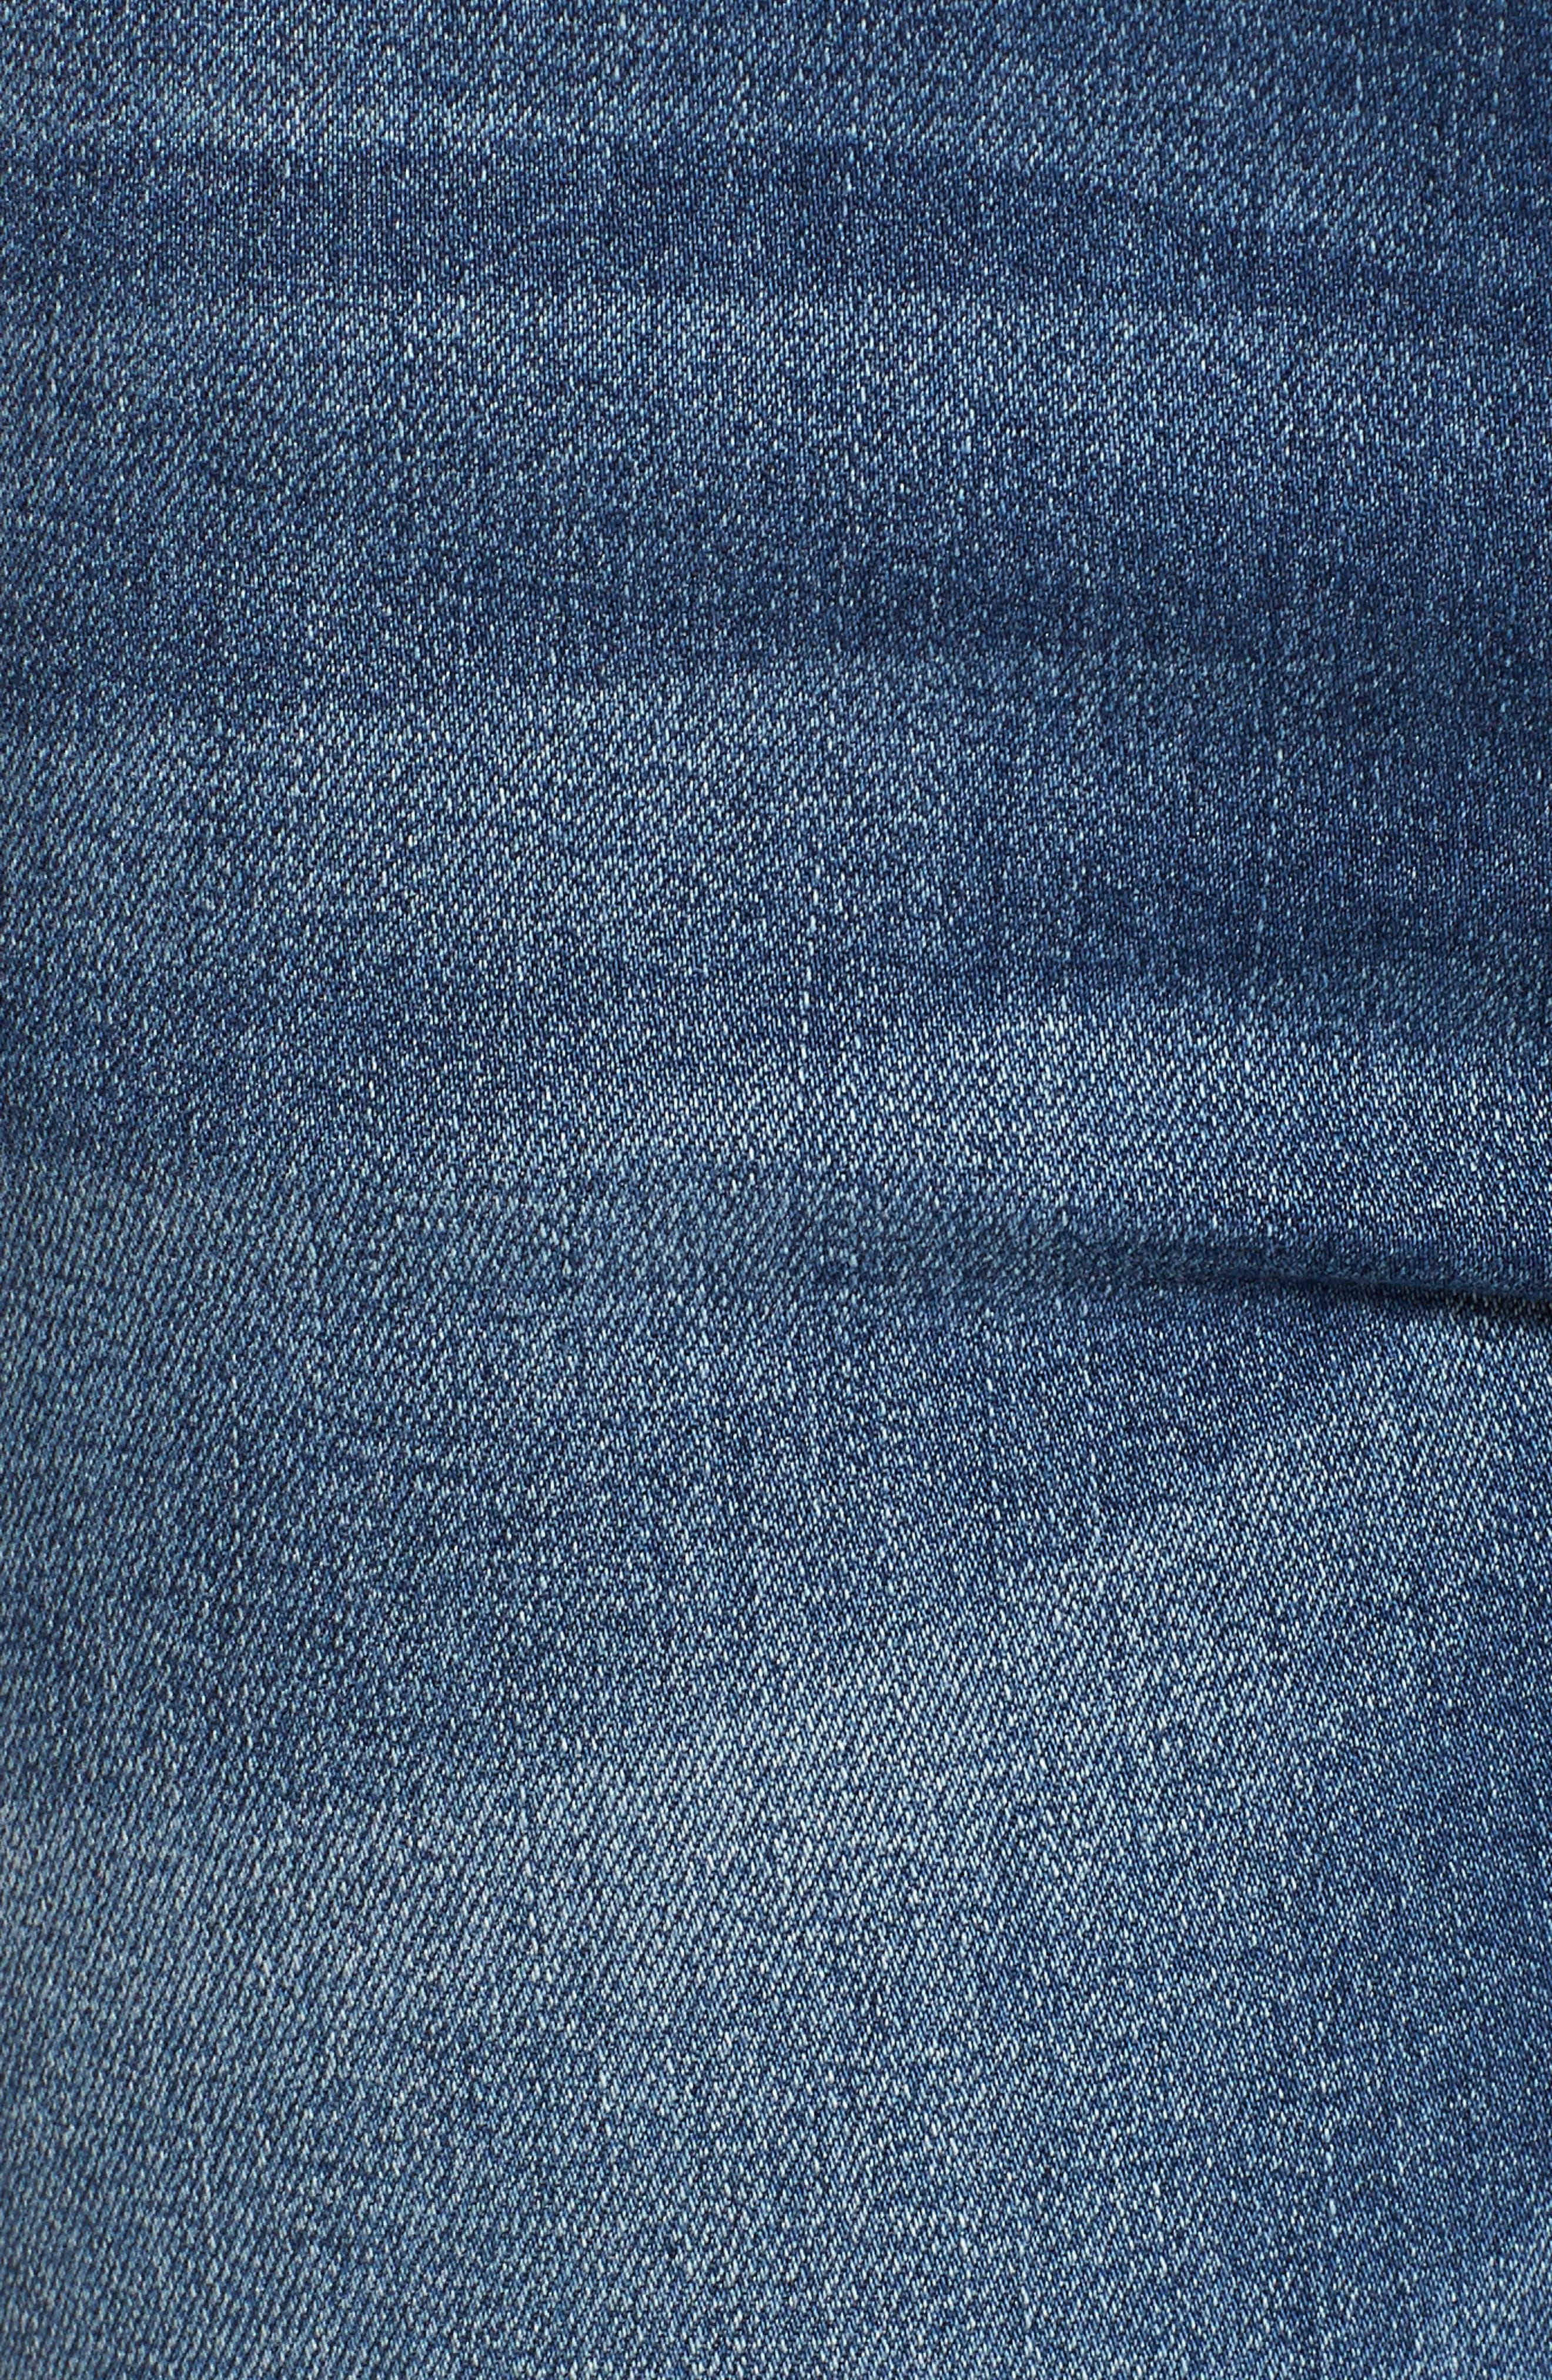 Release Hem Skinny Jeans,                             Alternate thumbnail 3, color,                             Pretty